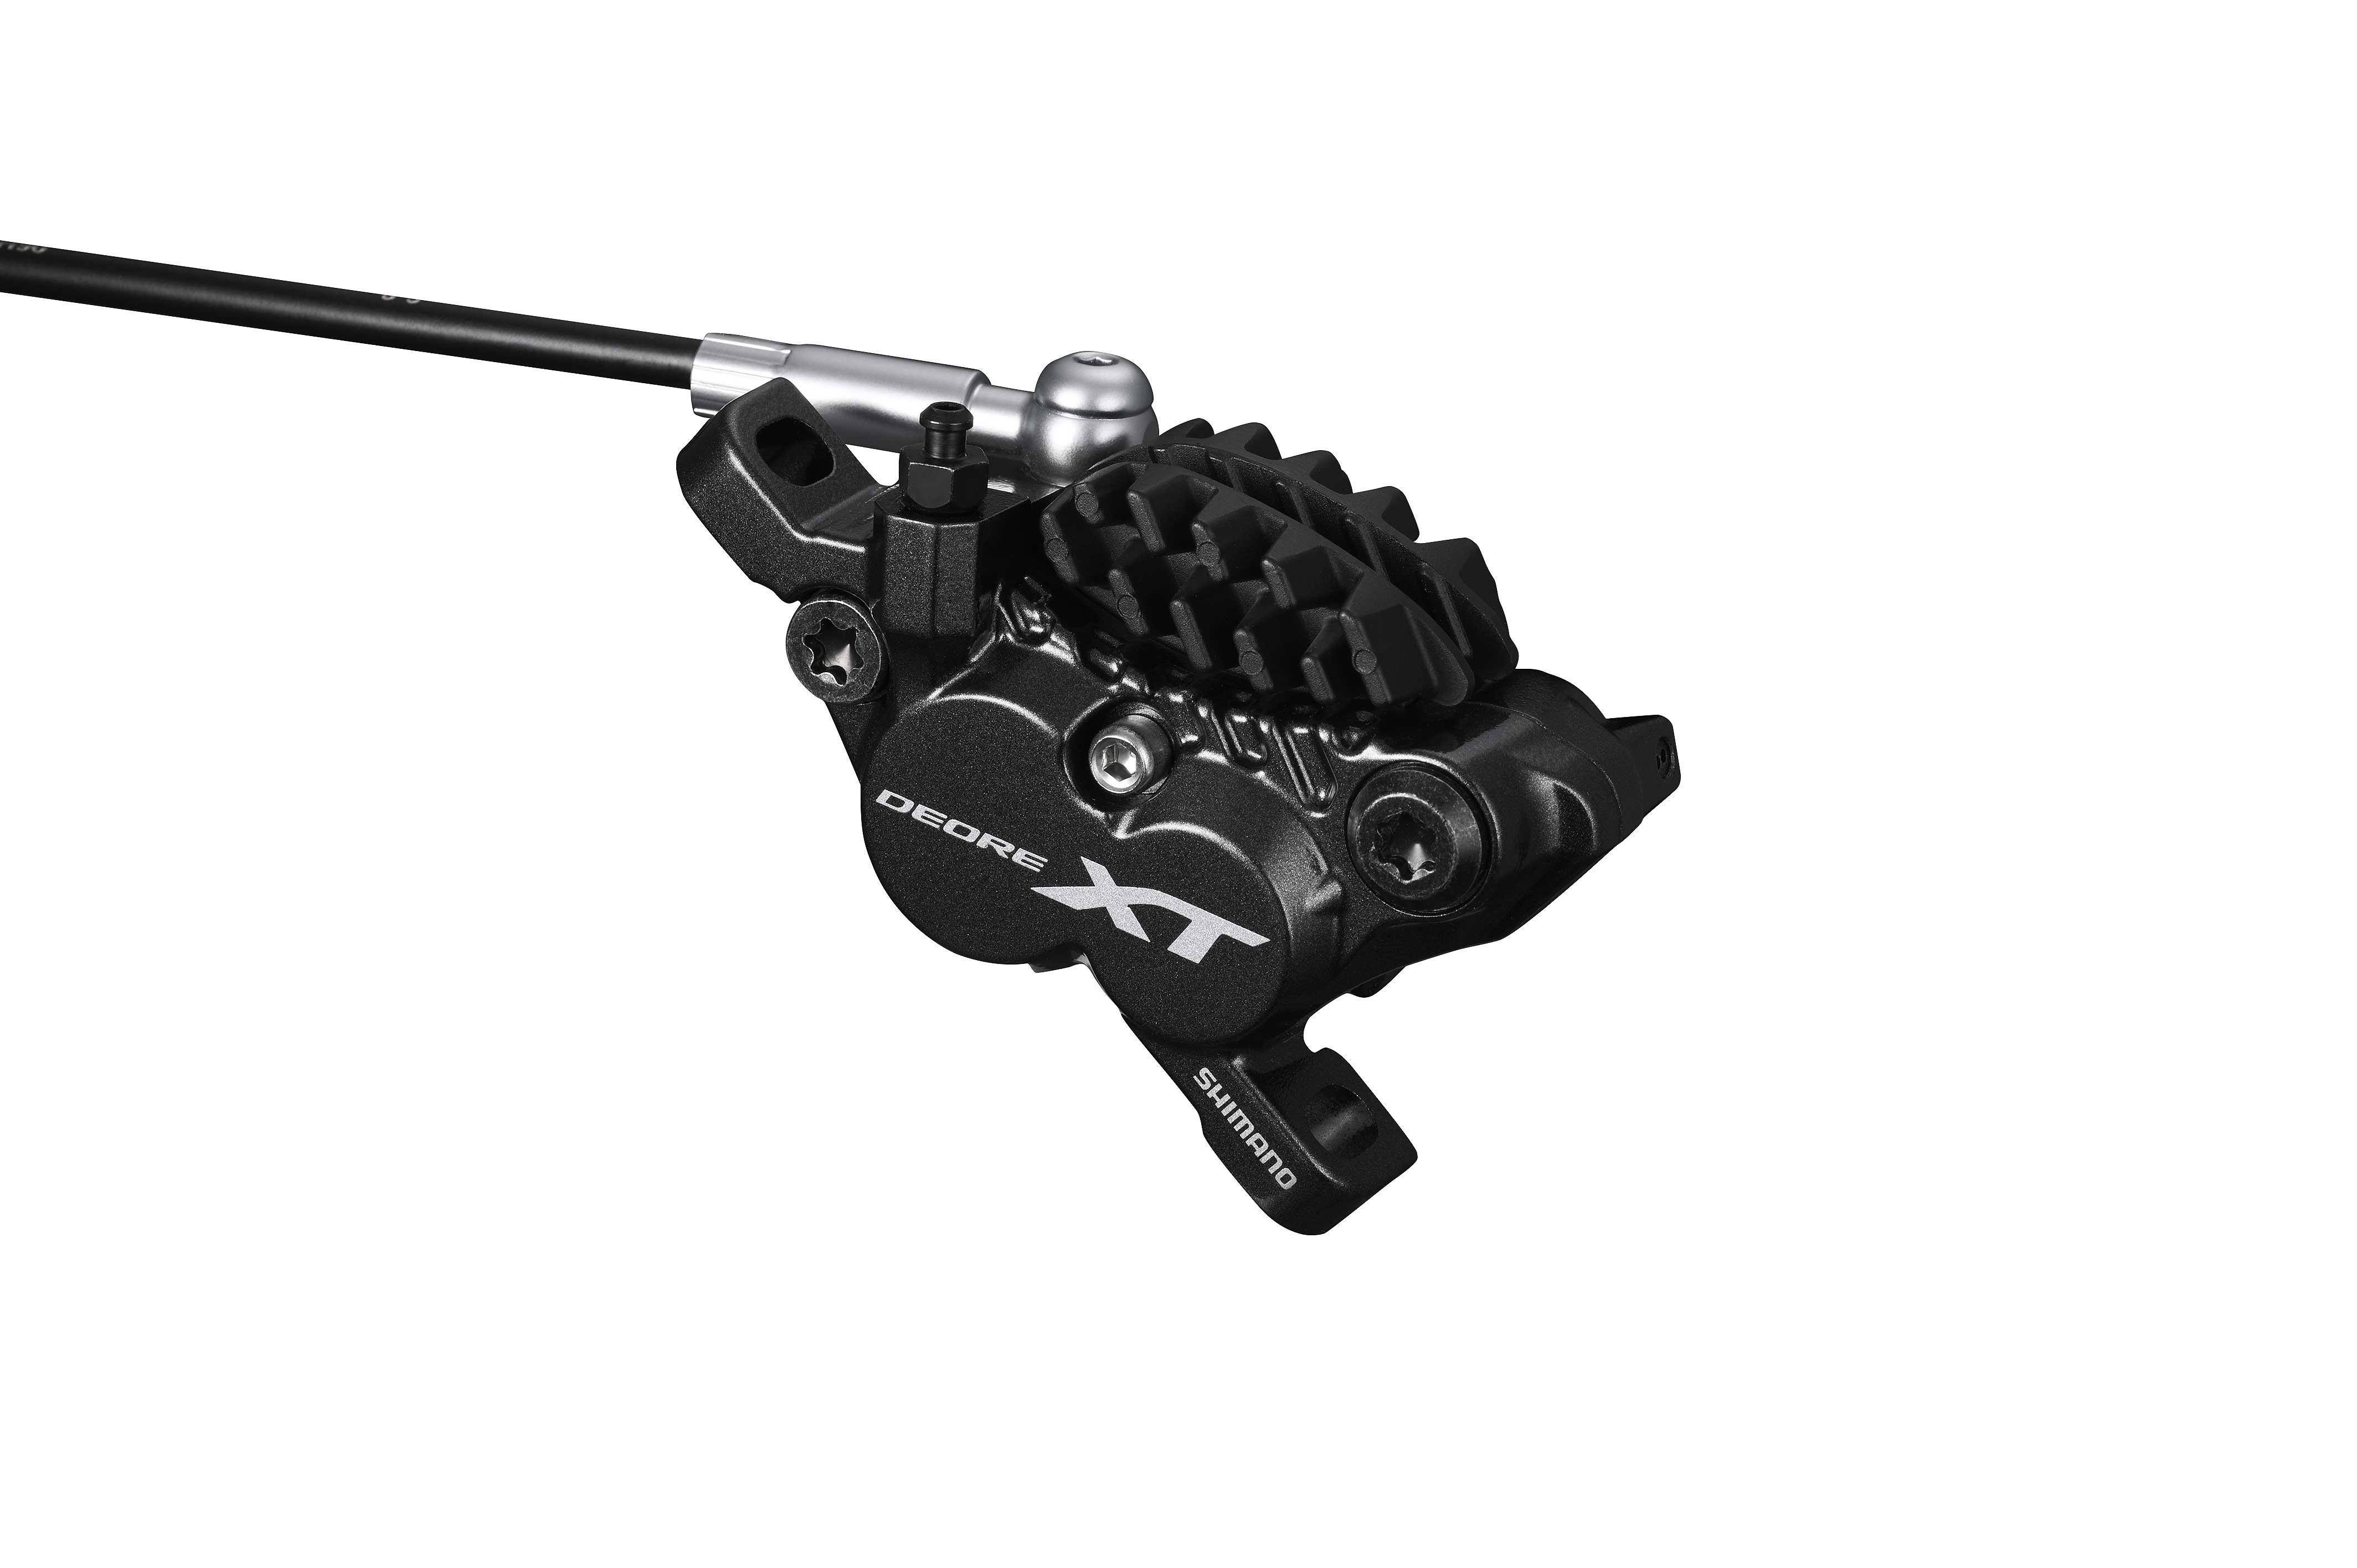 Shimano XT-Bremse BR-M8020: 4 Kolben